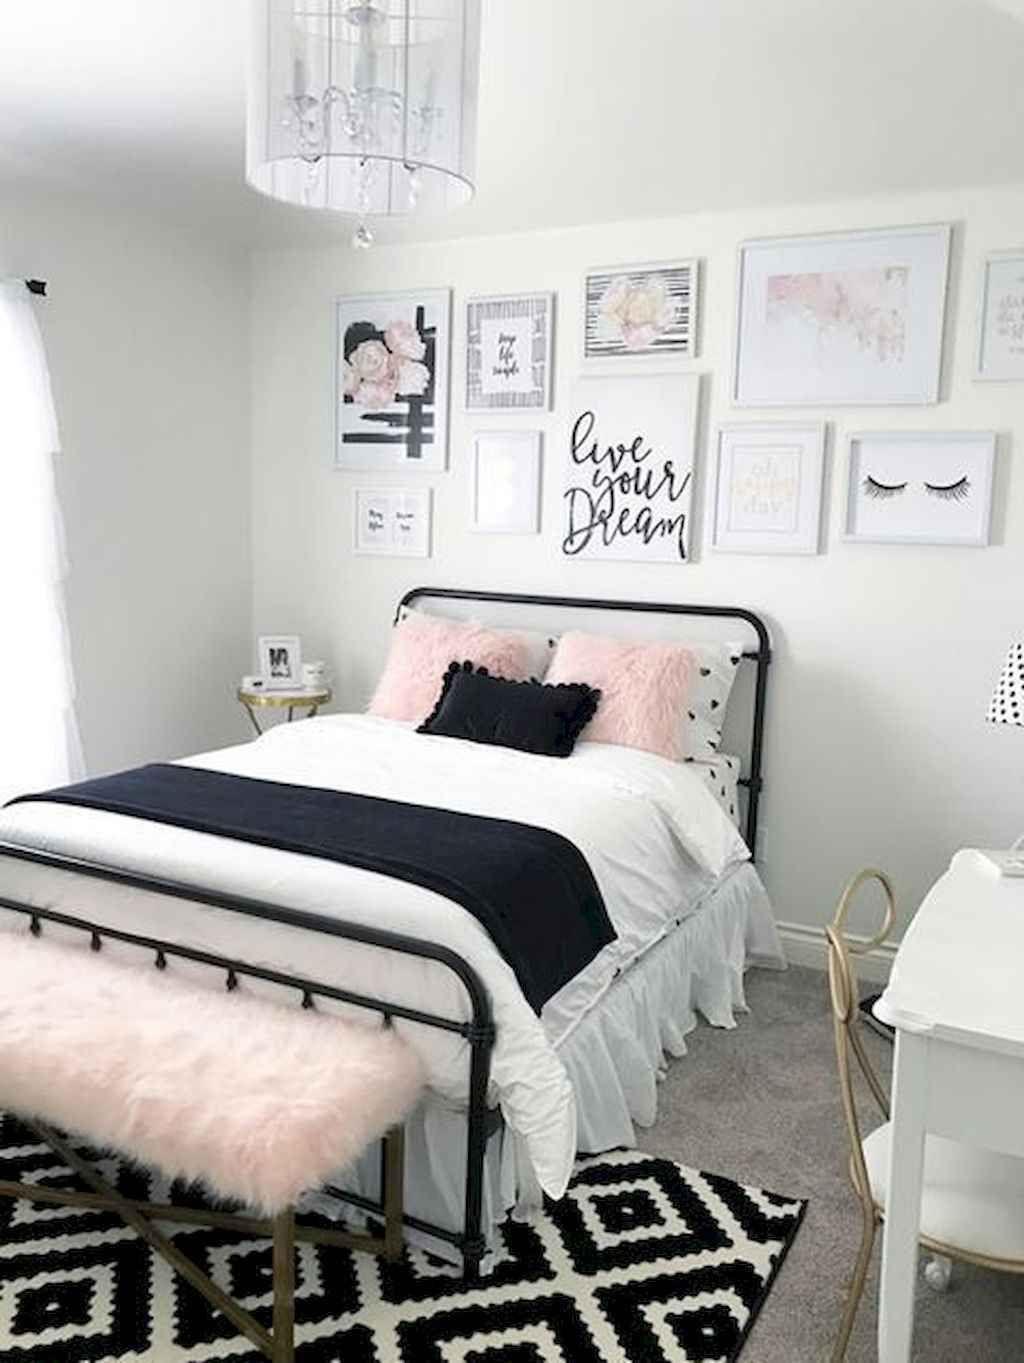 71 Simple Bedroom Decorating Ideas With Beautiful Color Decoracao Quarto Pequeno Feminino Quarto Minimalista Pequeno Decoracao Quarto Pequeno